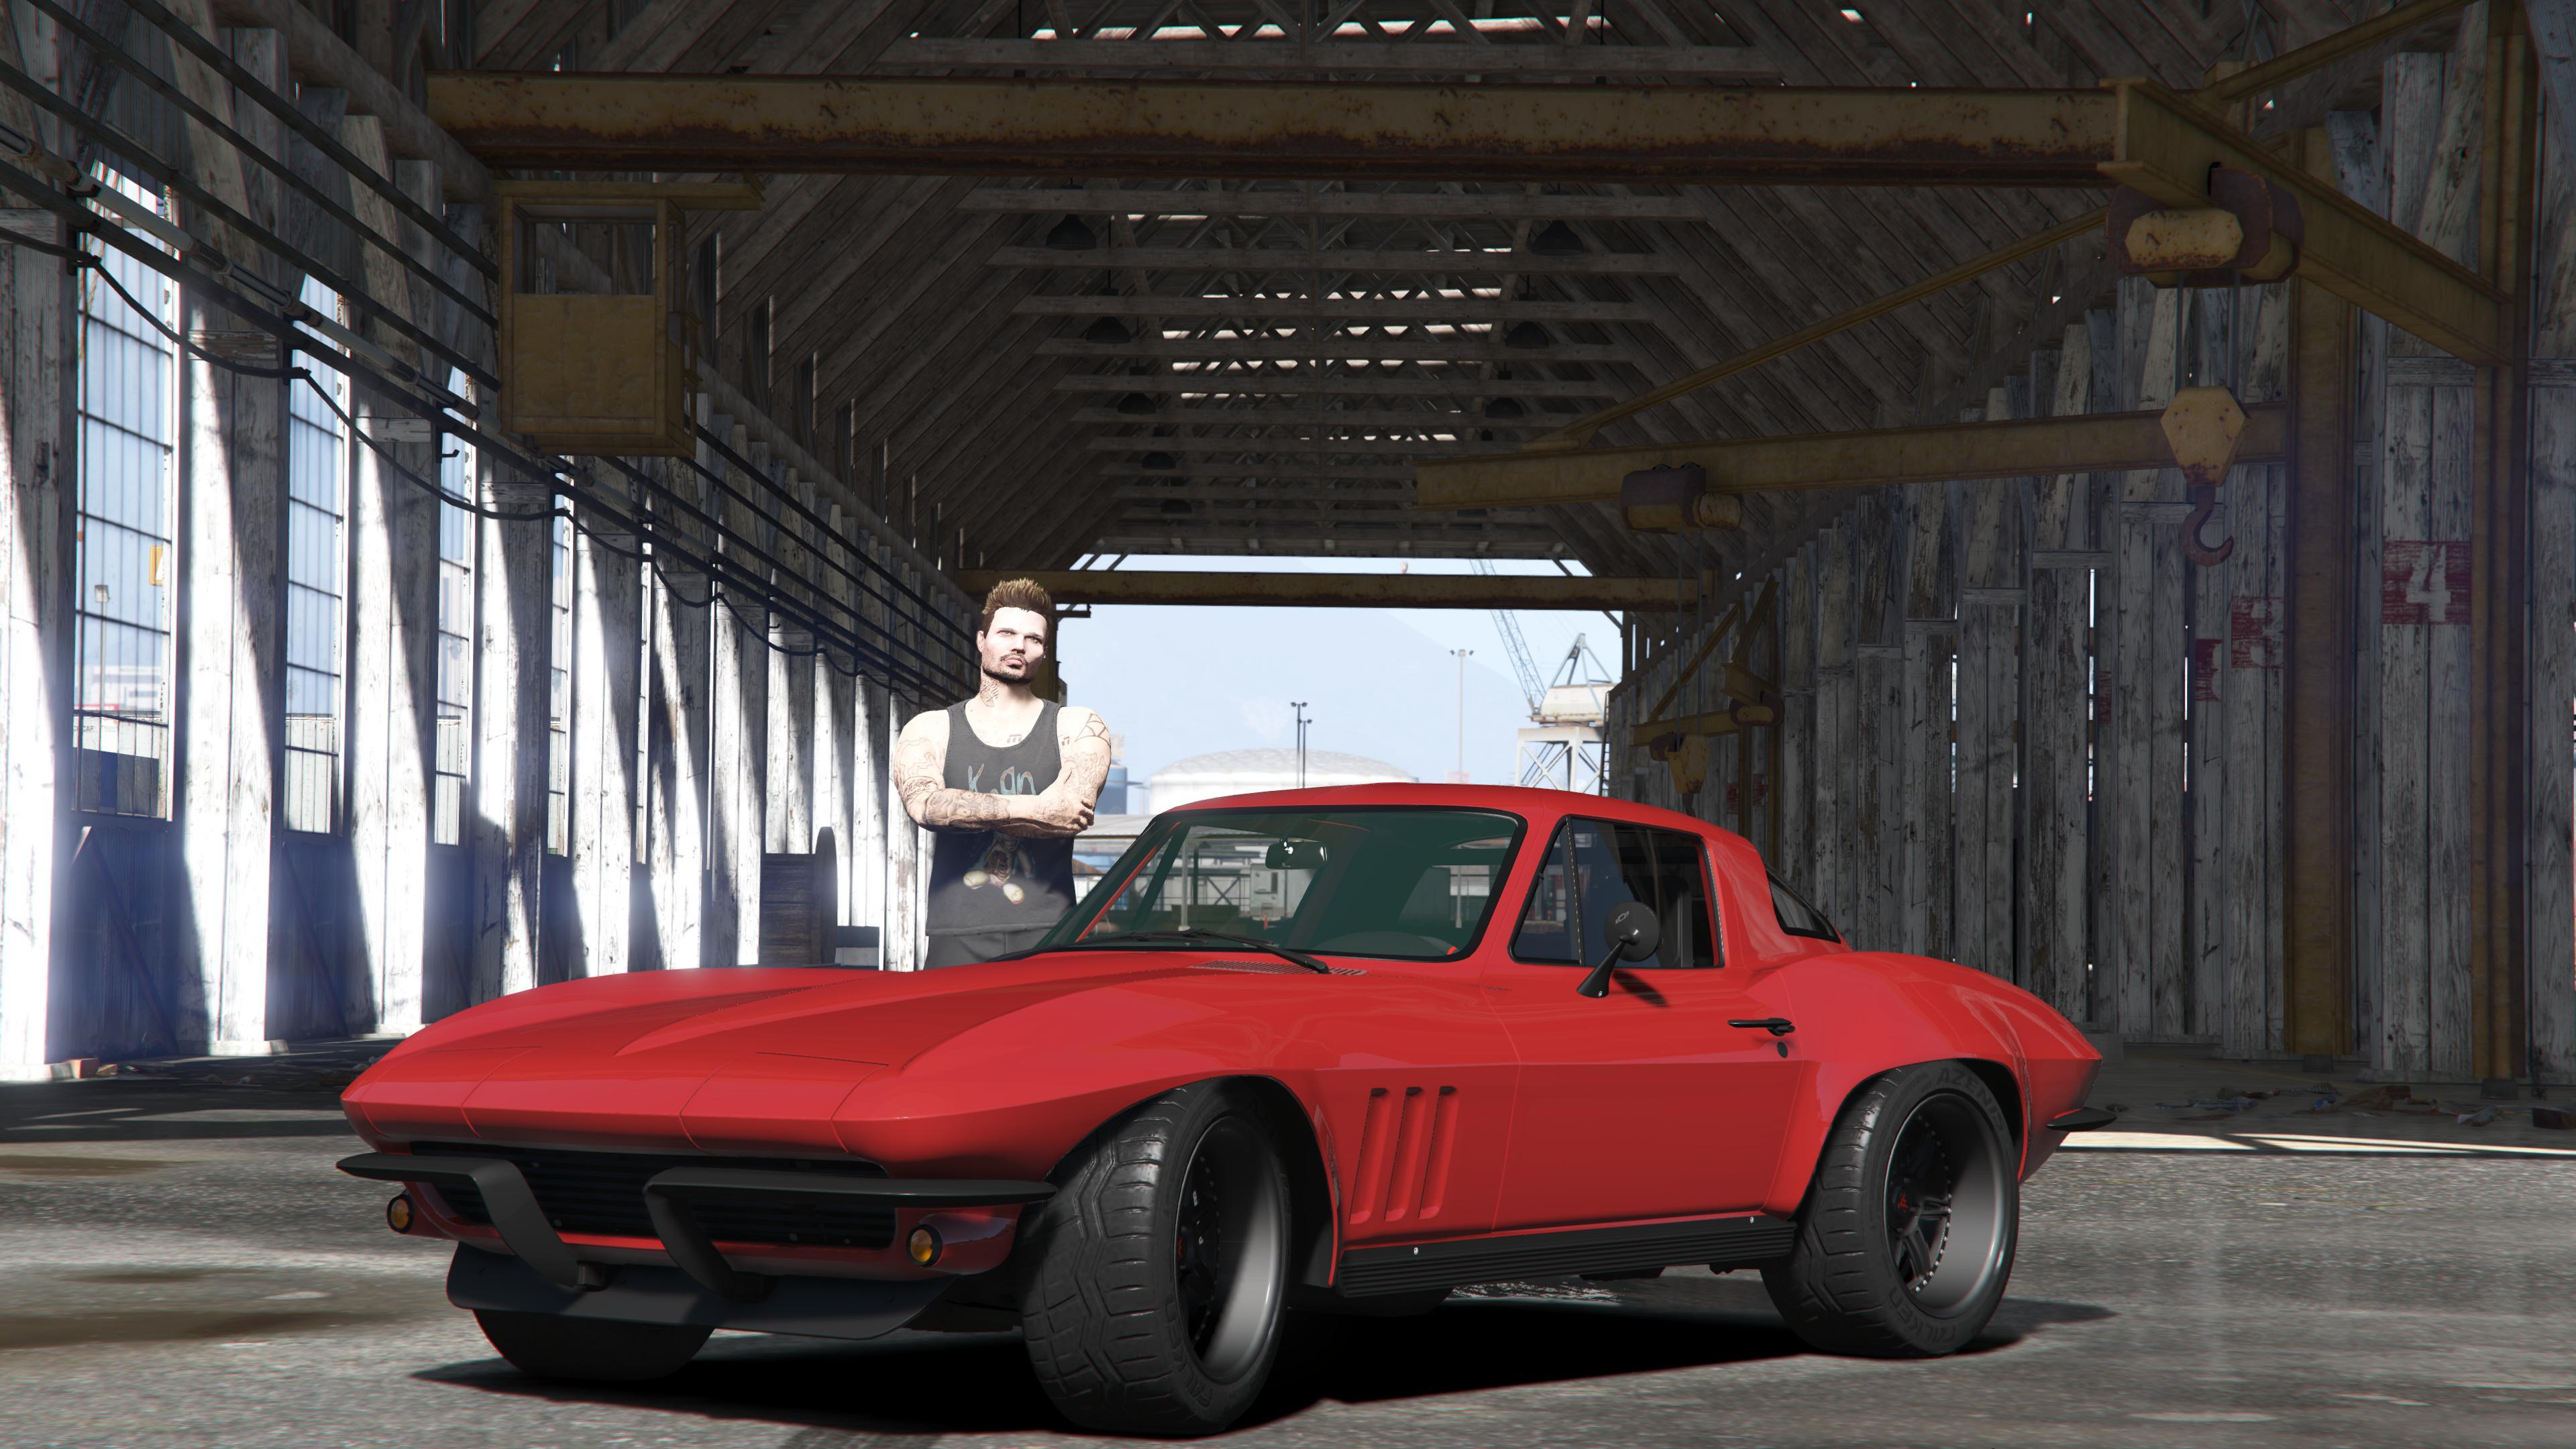 1966 Chevrolet Corvette Stingray from Fast & Furious 8 GTA5 Mods